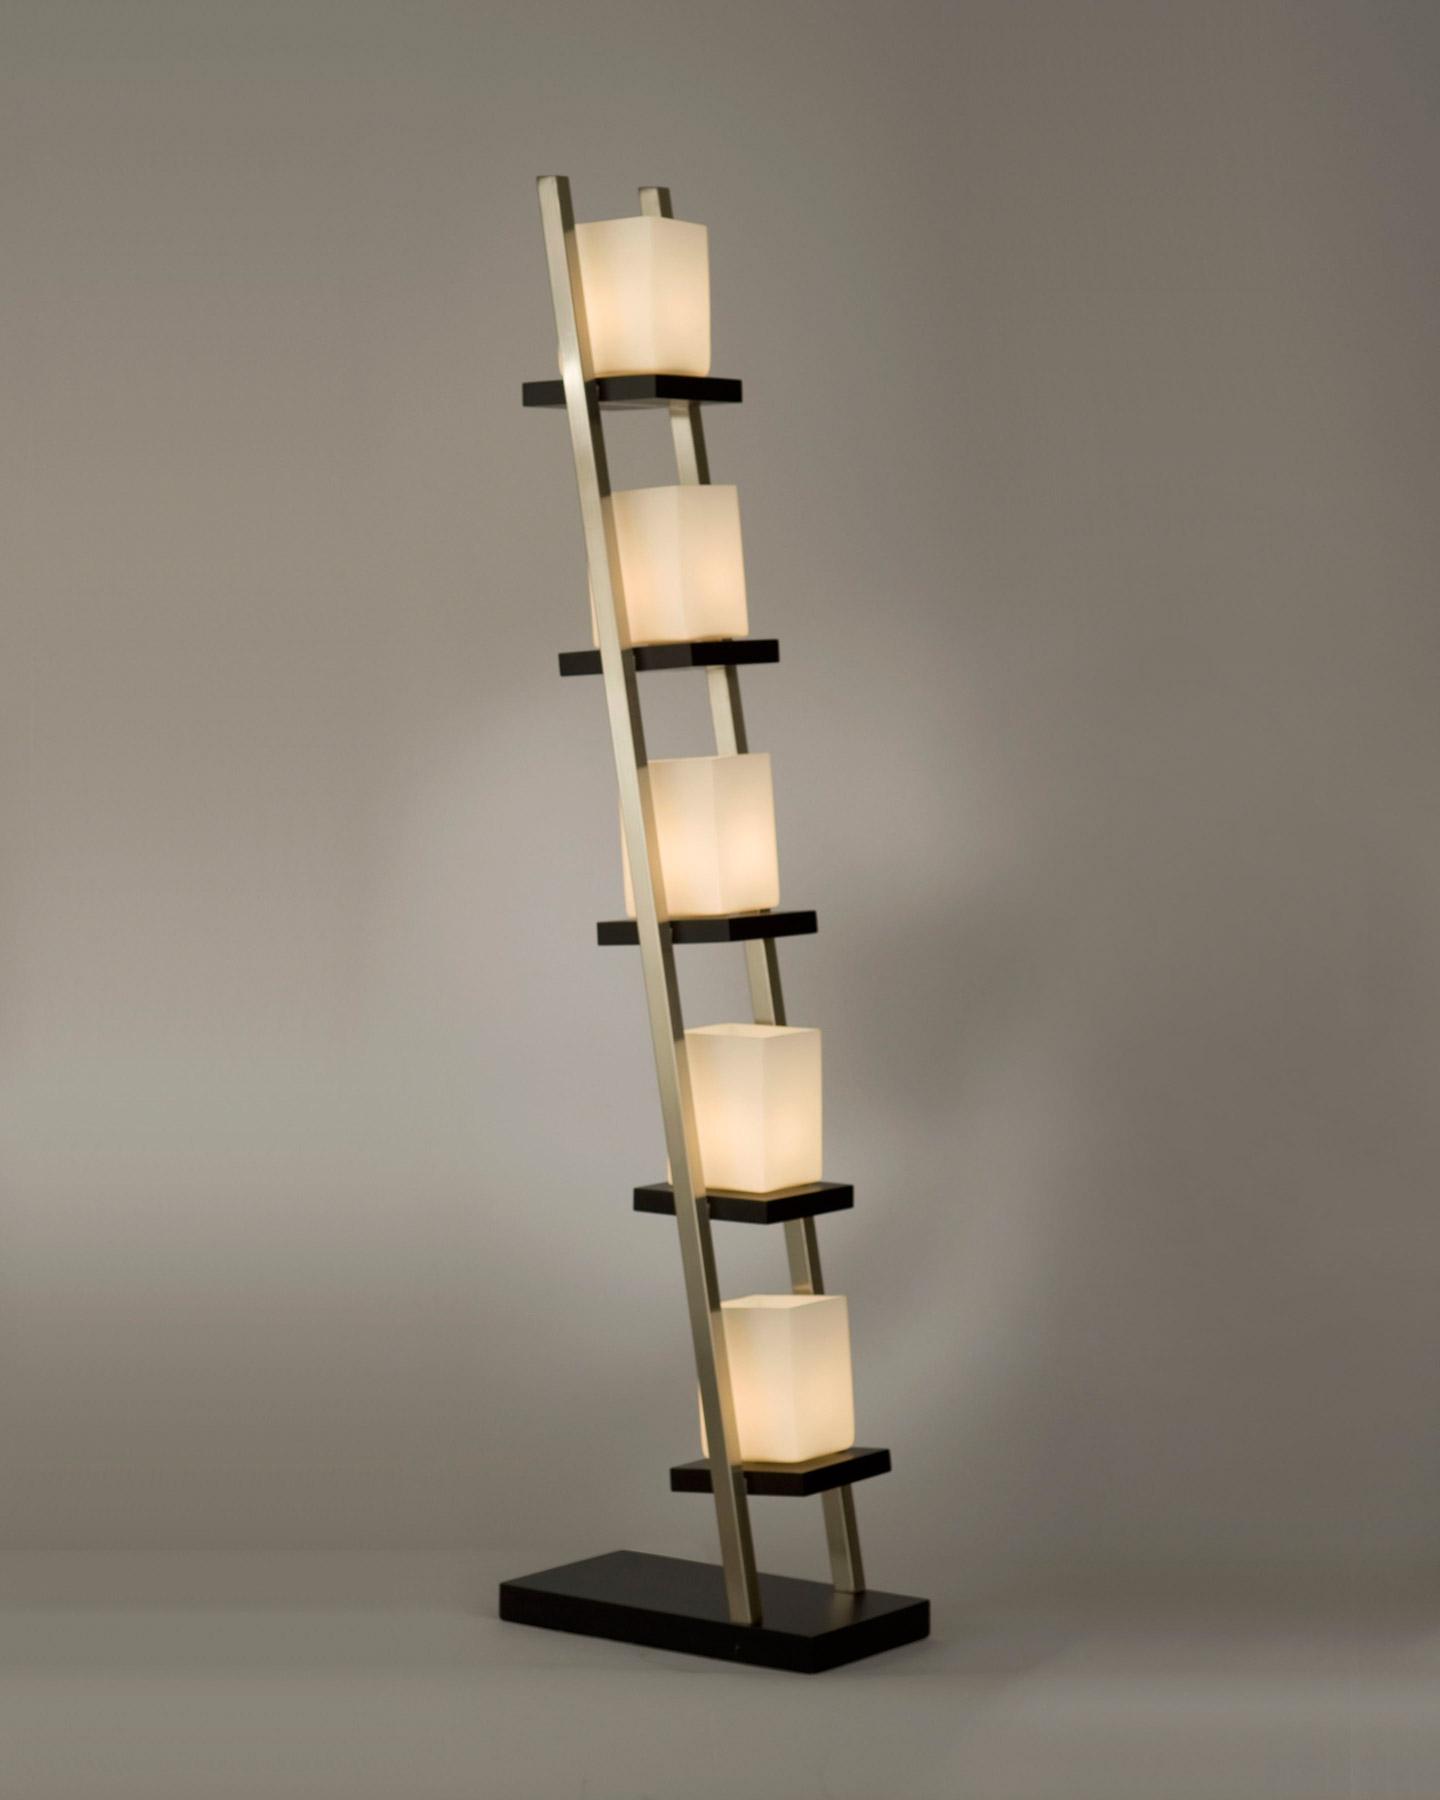 lamps floor lamps standard floor lamps nova lighting. Black Bedroom Furniture Sets. Home Design Ideas